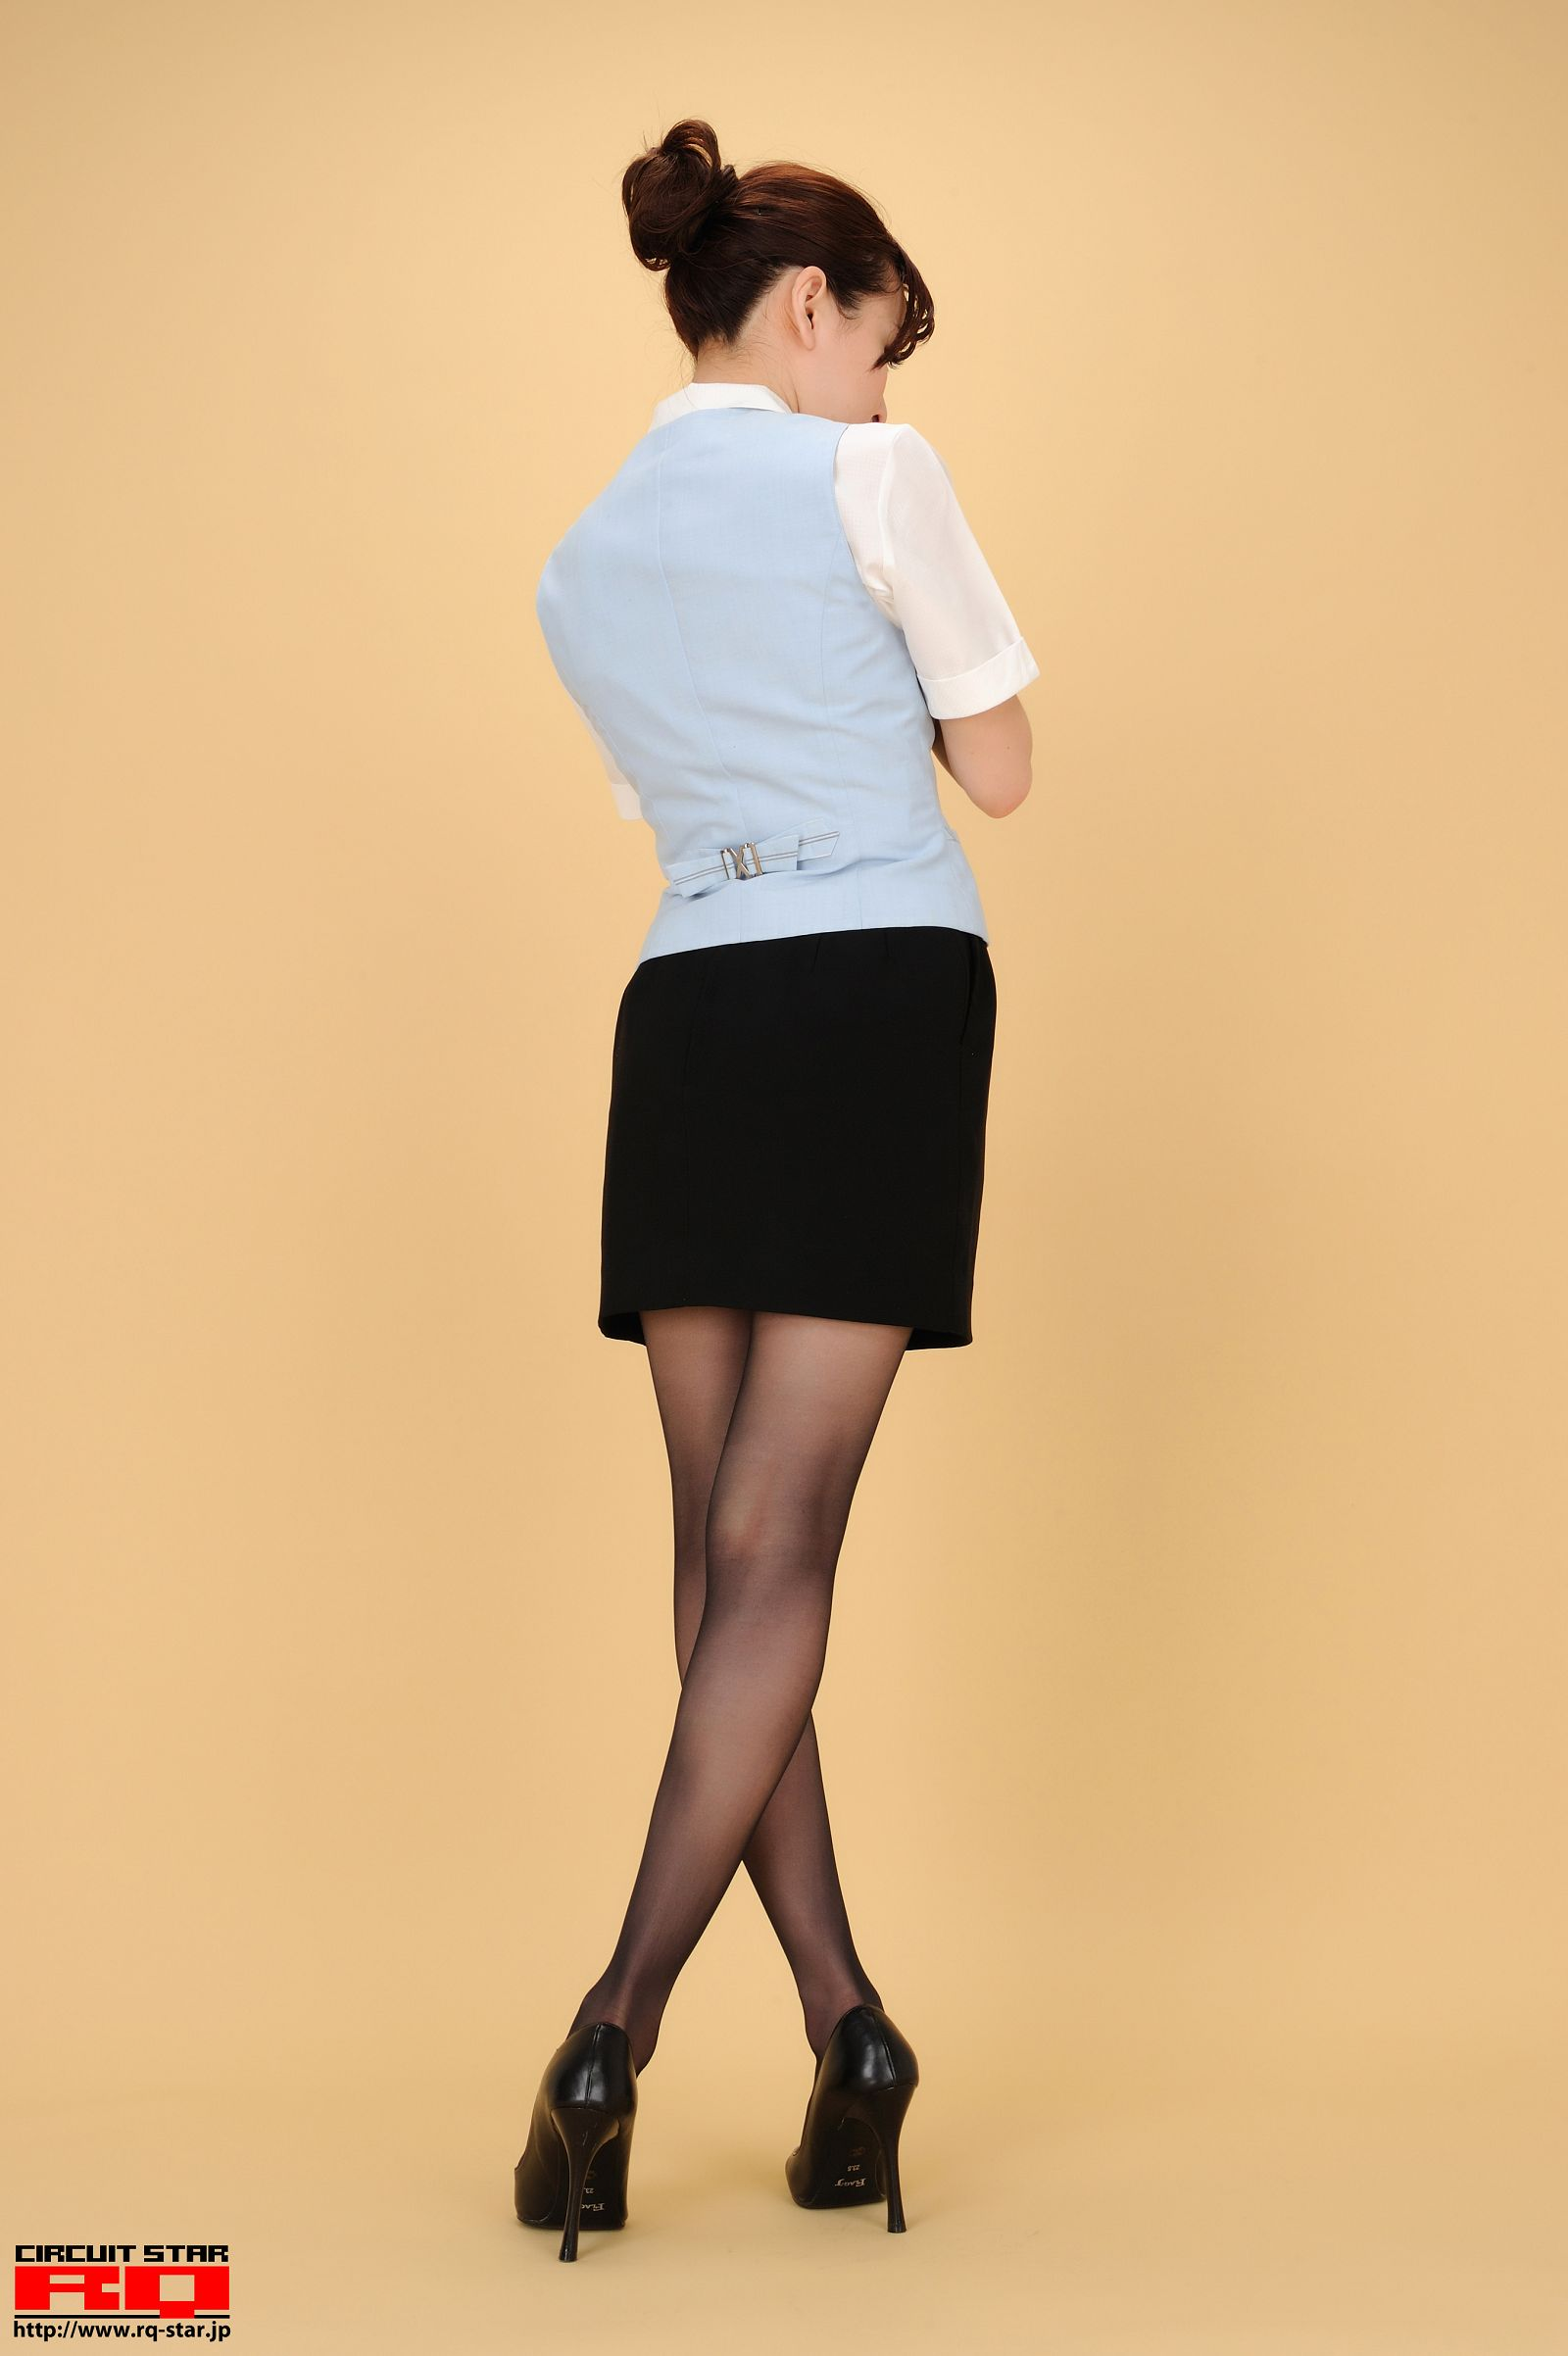 [RQ STAR美女] NO.00487 Yurika Nikita 二北ユリカ Office Lady[87P] RQ STAR 第4张